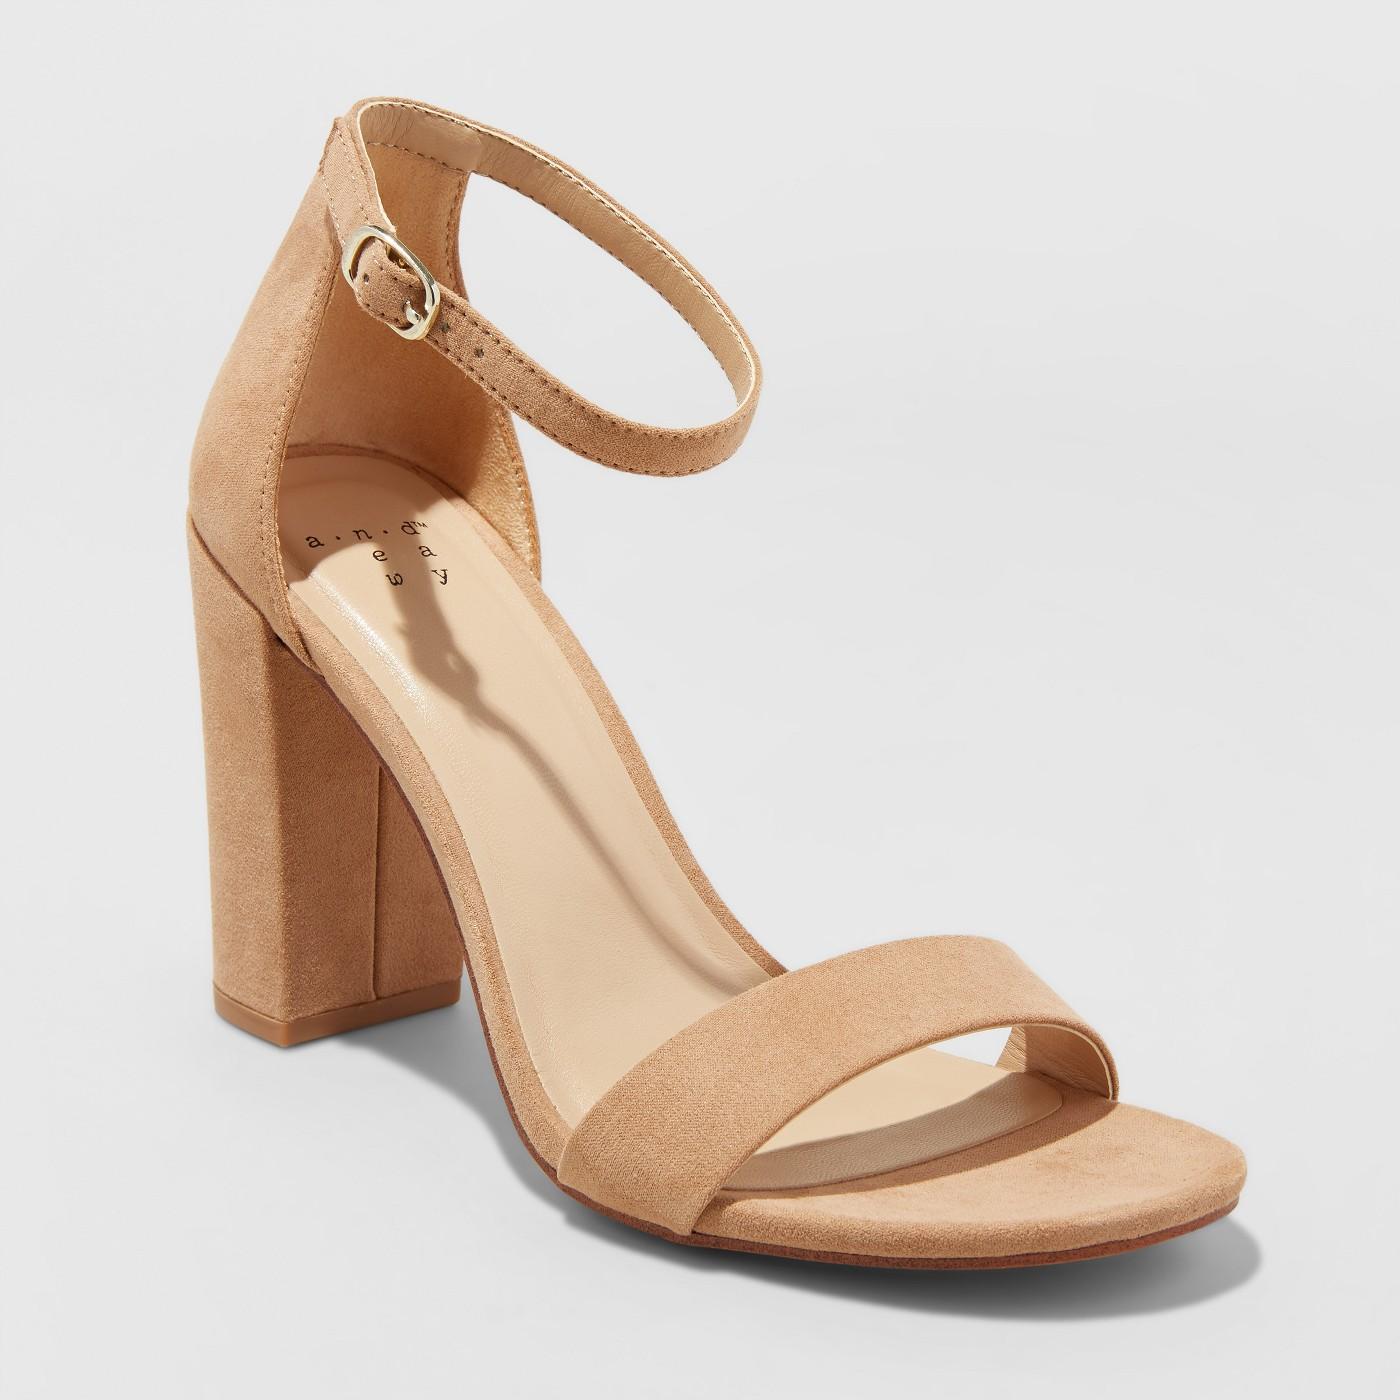 Women's Ema High Block Heel Pumps - A New Day™ - image 1 of 3